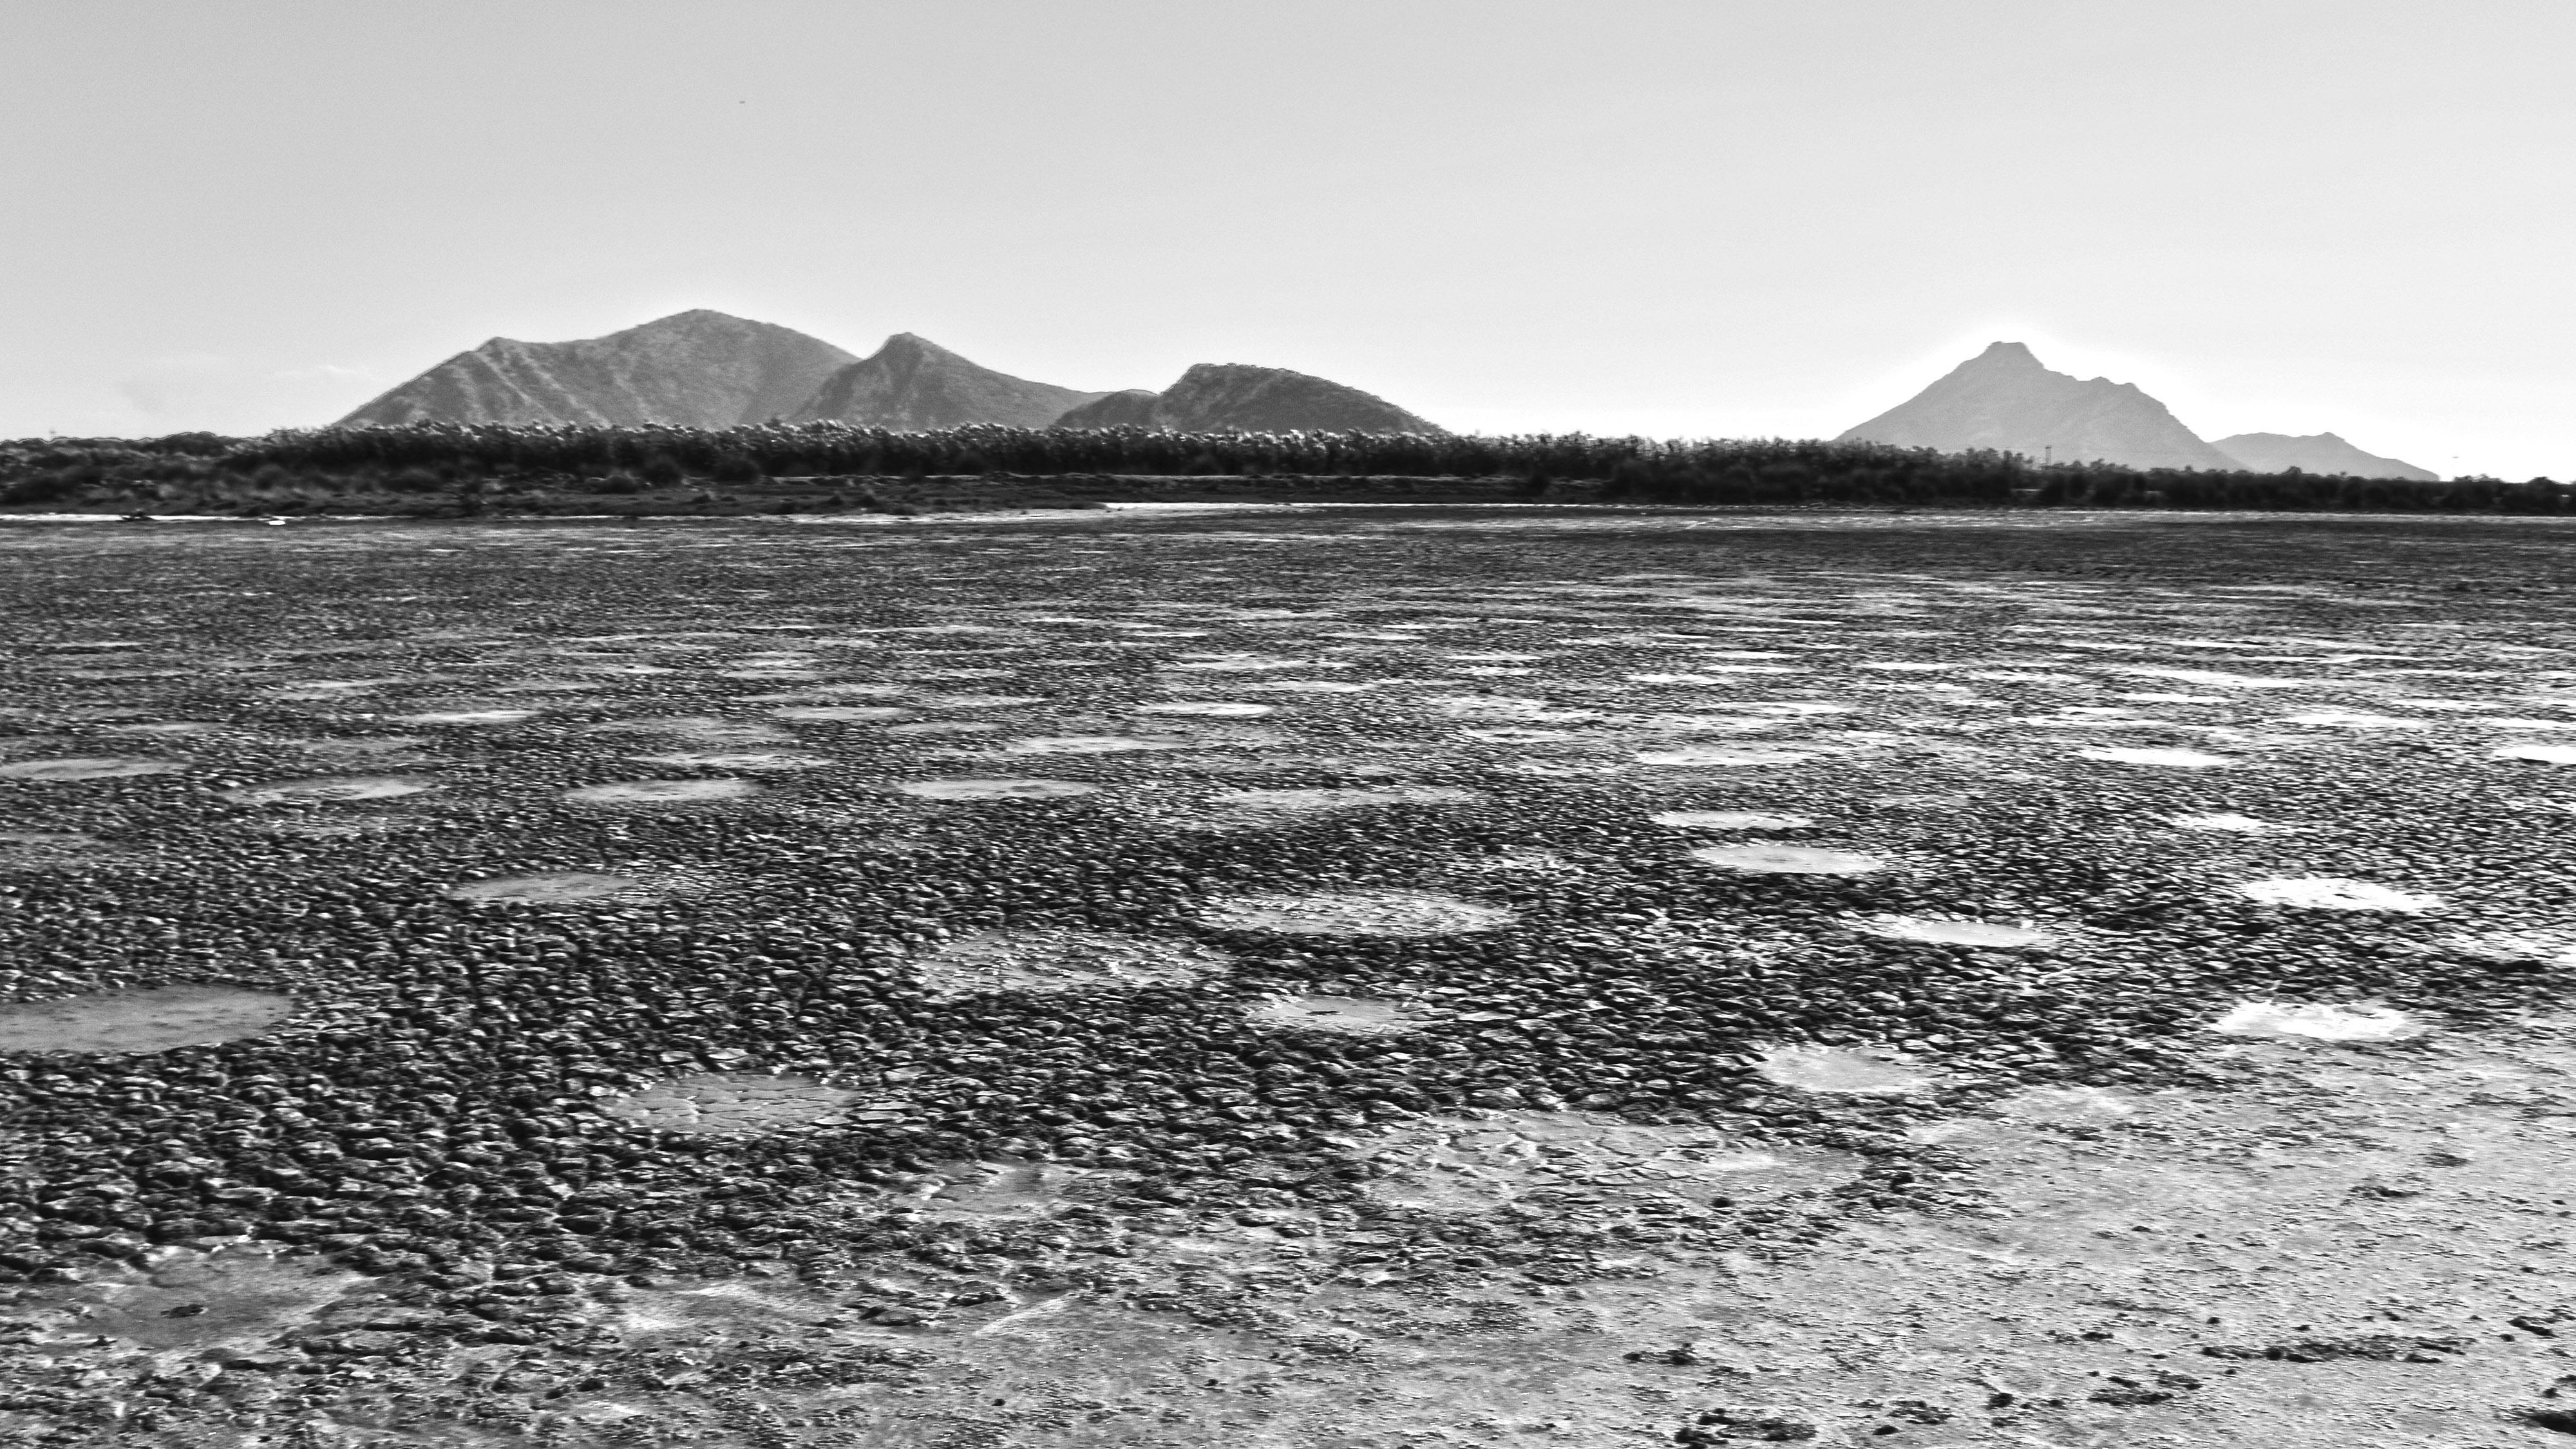 13_Dried_Land_Acheloos_River_Aitoloakarnania_Greece_2017